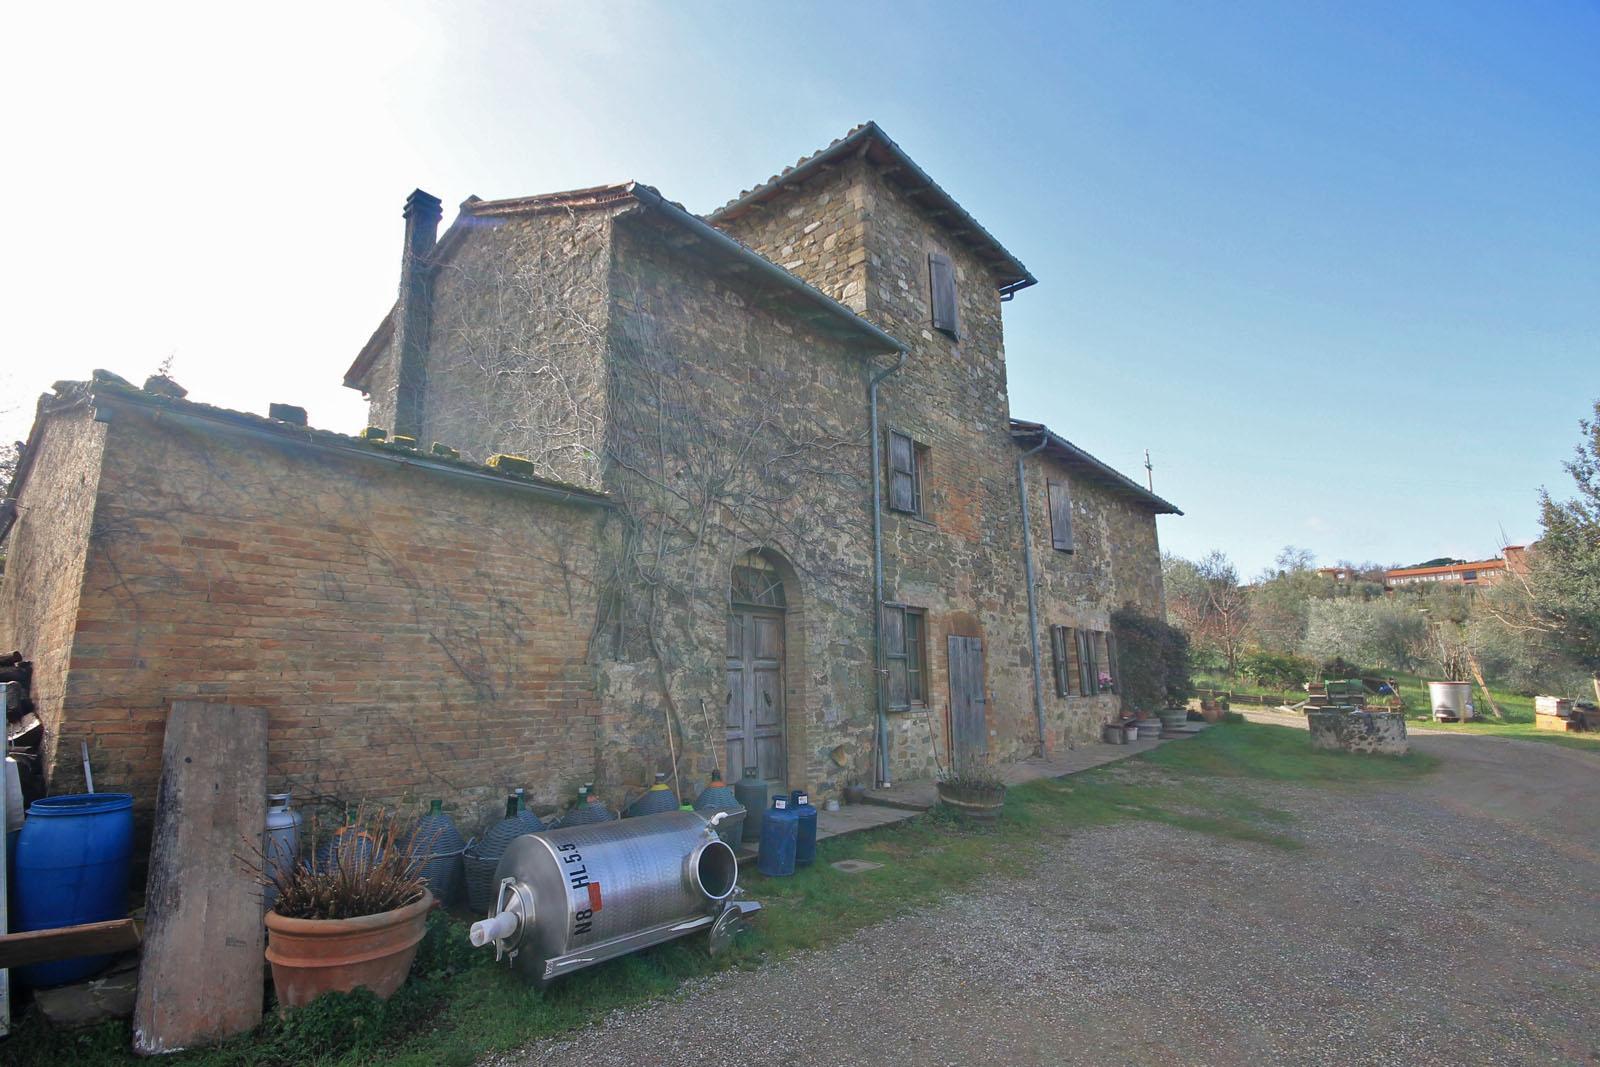 Casale in vendita in toscana a montalcino immobiliare 3 emme - Casale in toscana ...